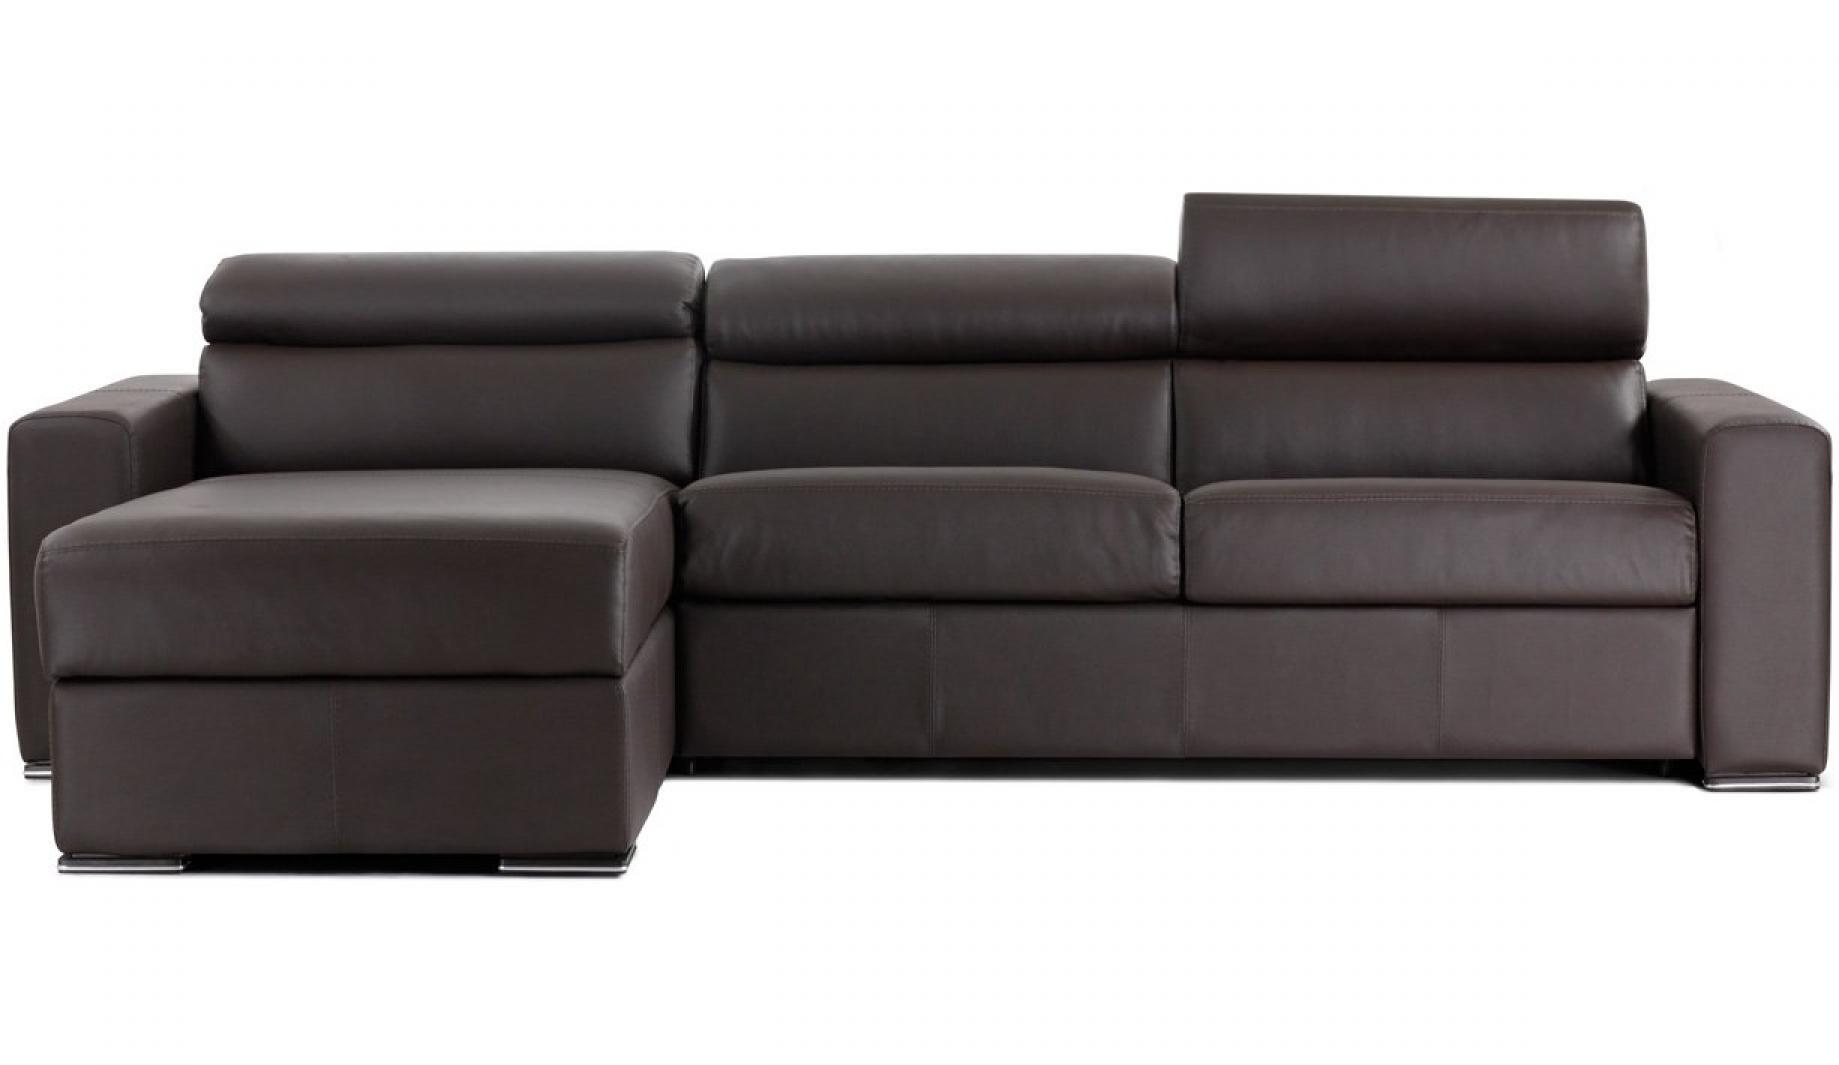 photos canap d 39 angle convertible pas cher en cuir. Black Bedroom Furniture Sets. Home Design Ideas